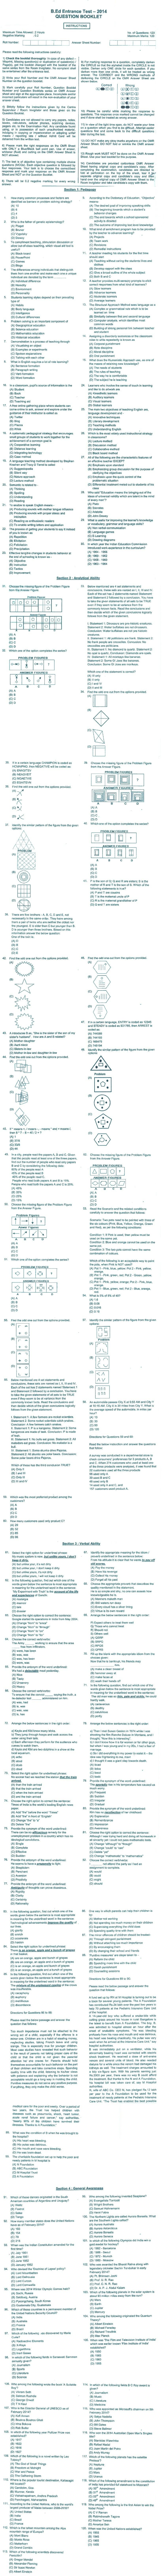 JAKBOPEE B.Ed 2014 Question Paper